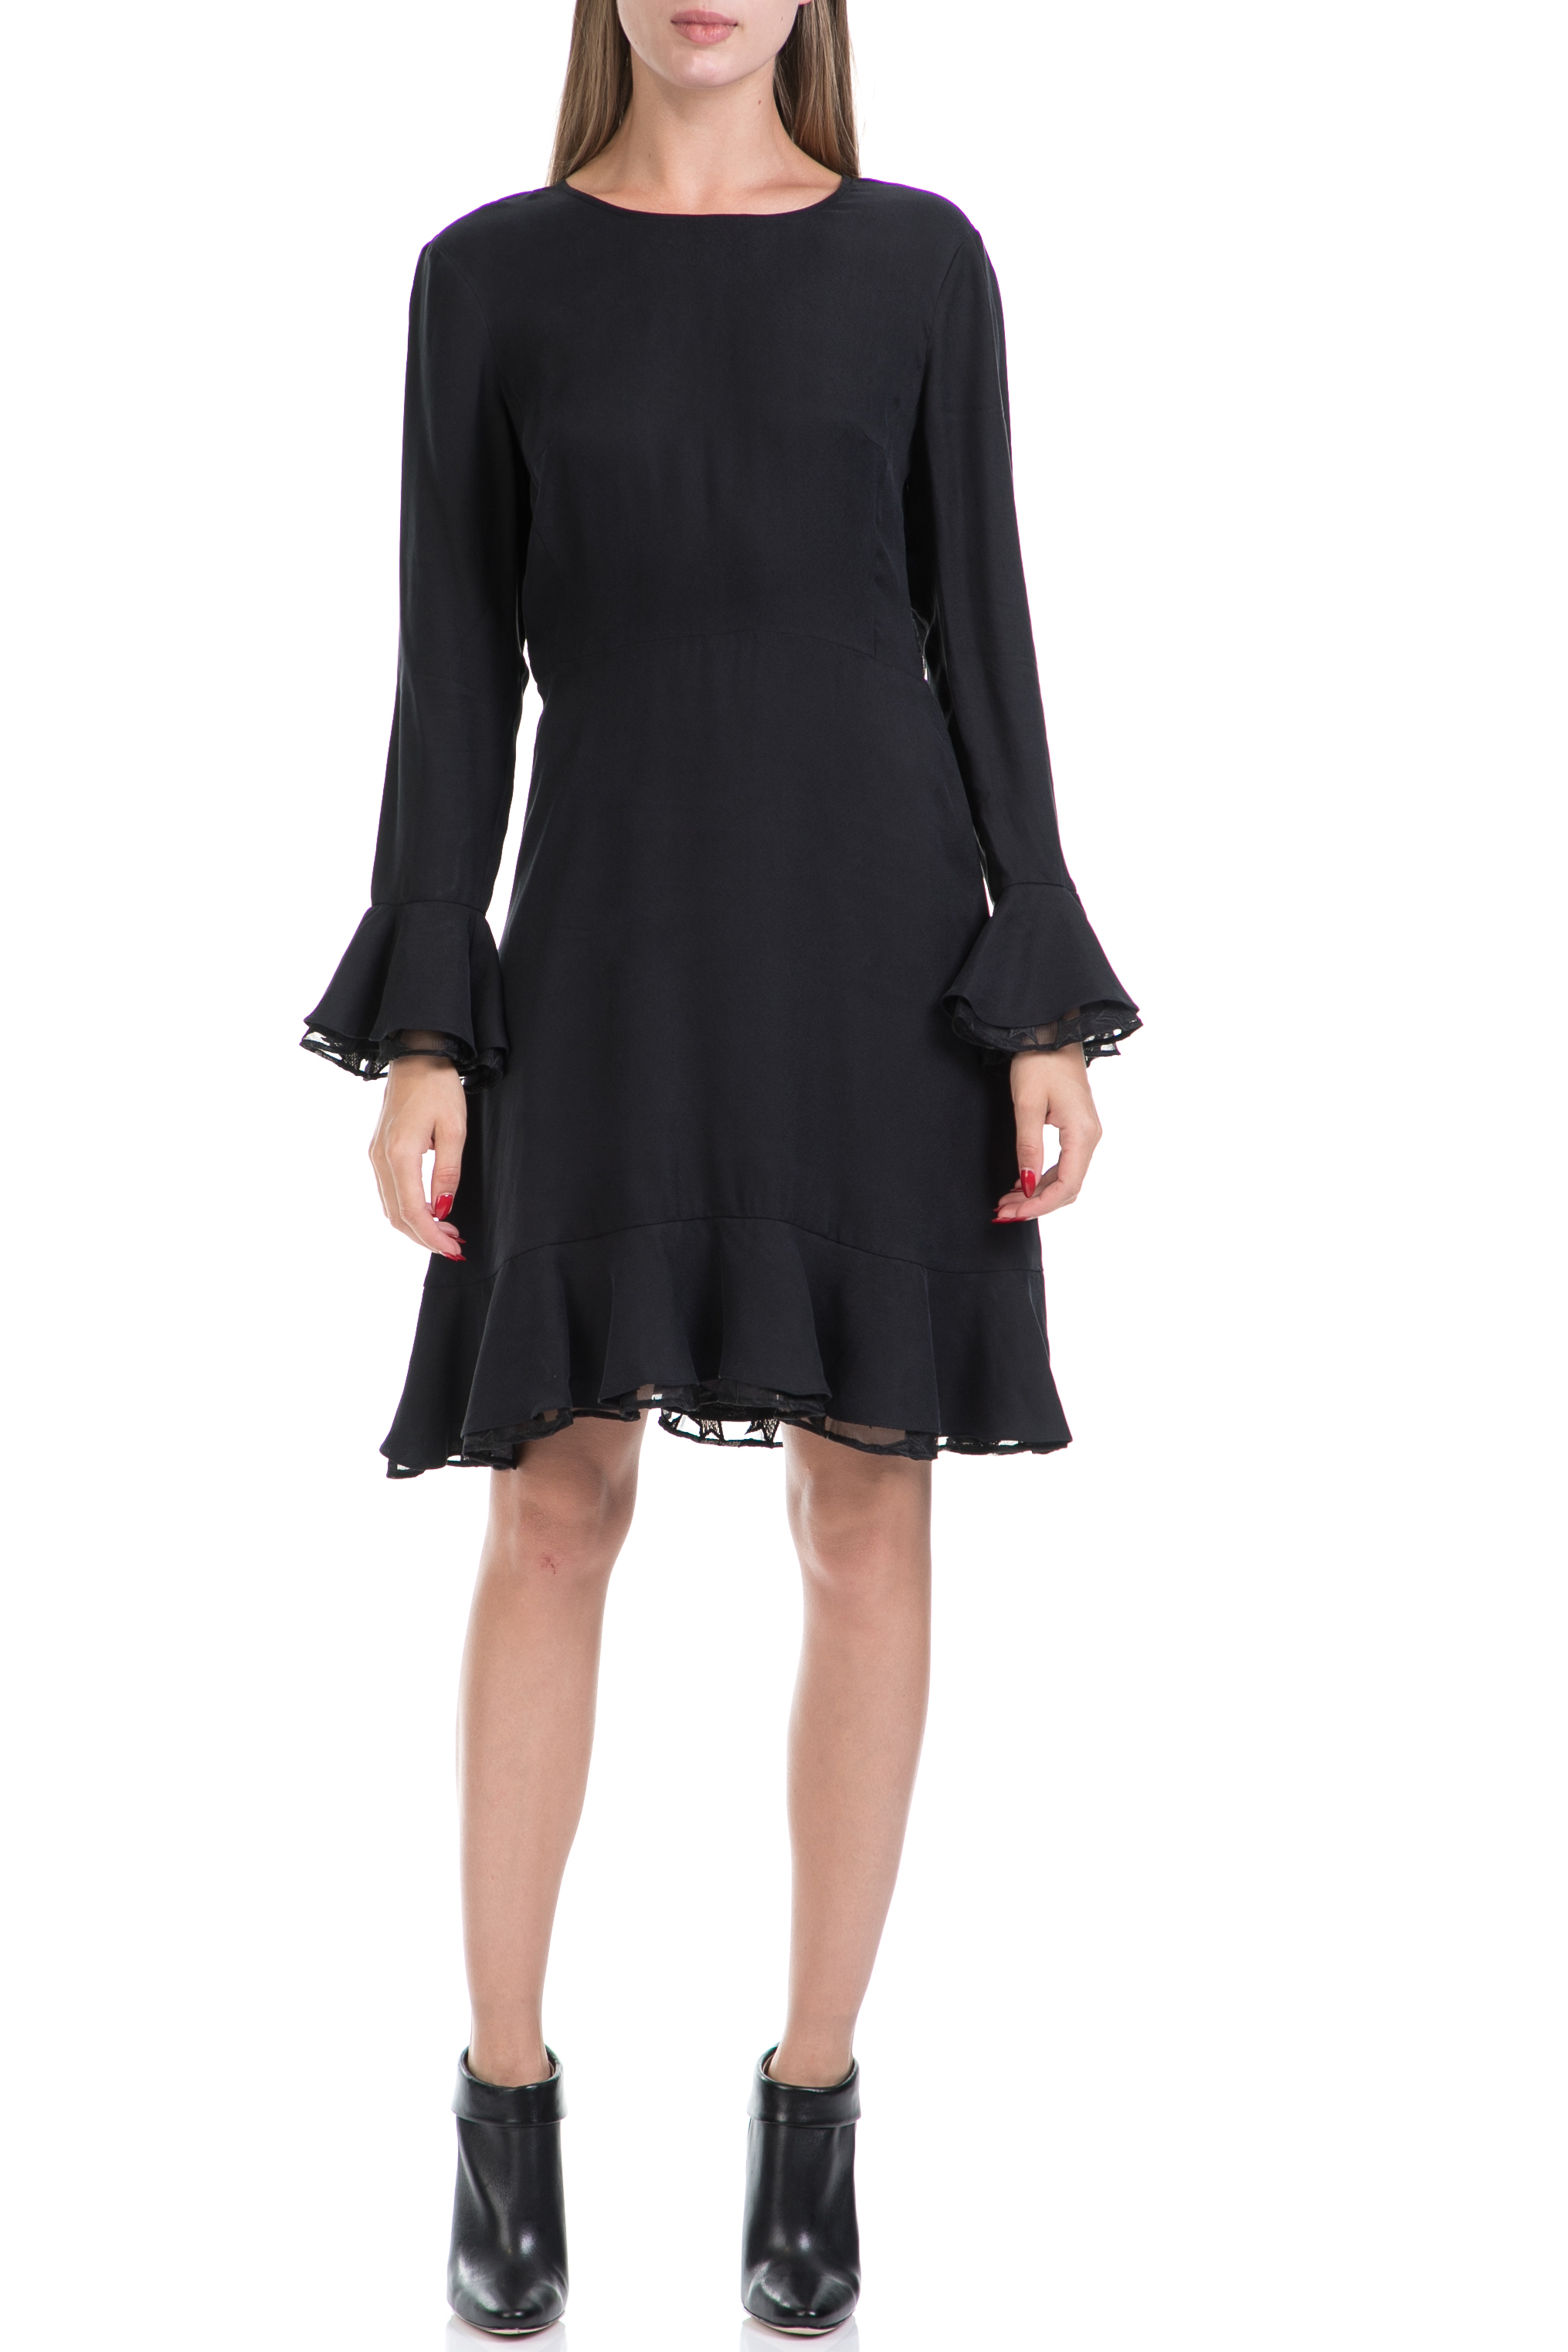 dc7f371e248 SCOTCH & SODA - Γυναικείο φόρεμα MAISON SCOTCH μαύρο ⋆ pressmedoll.gr